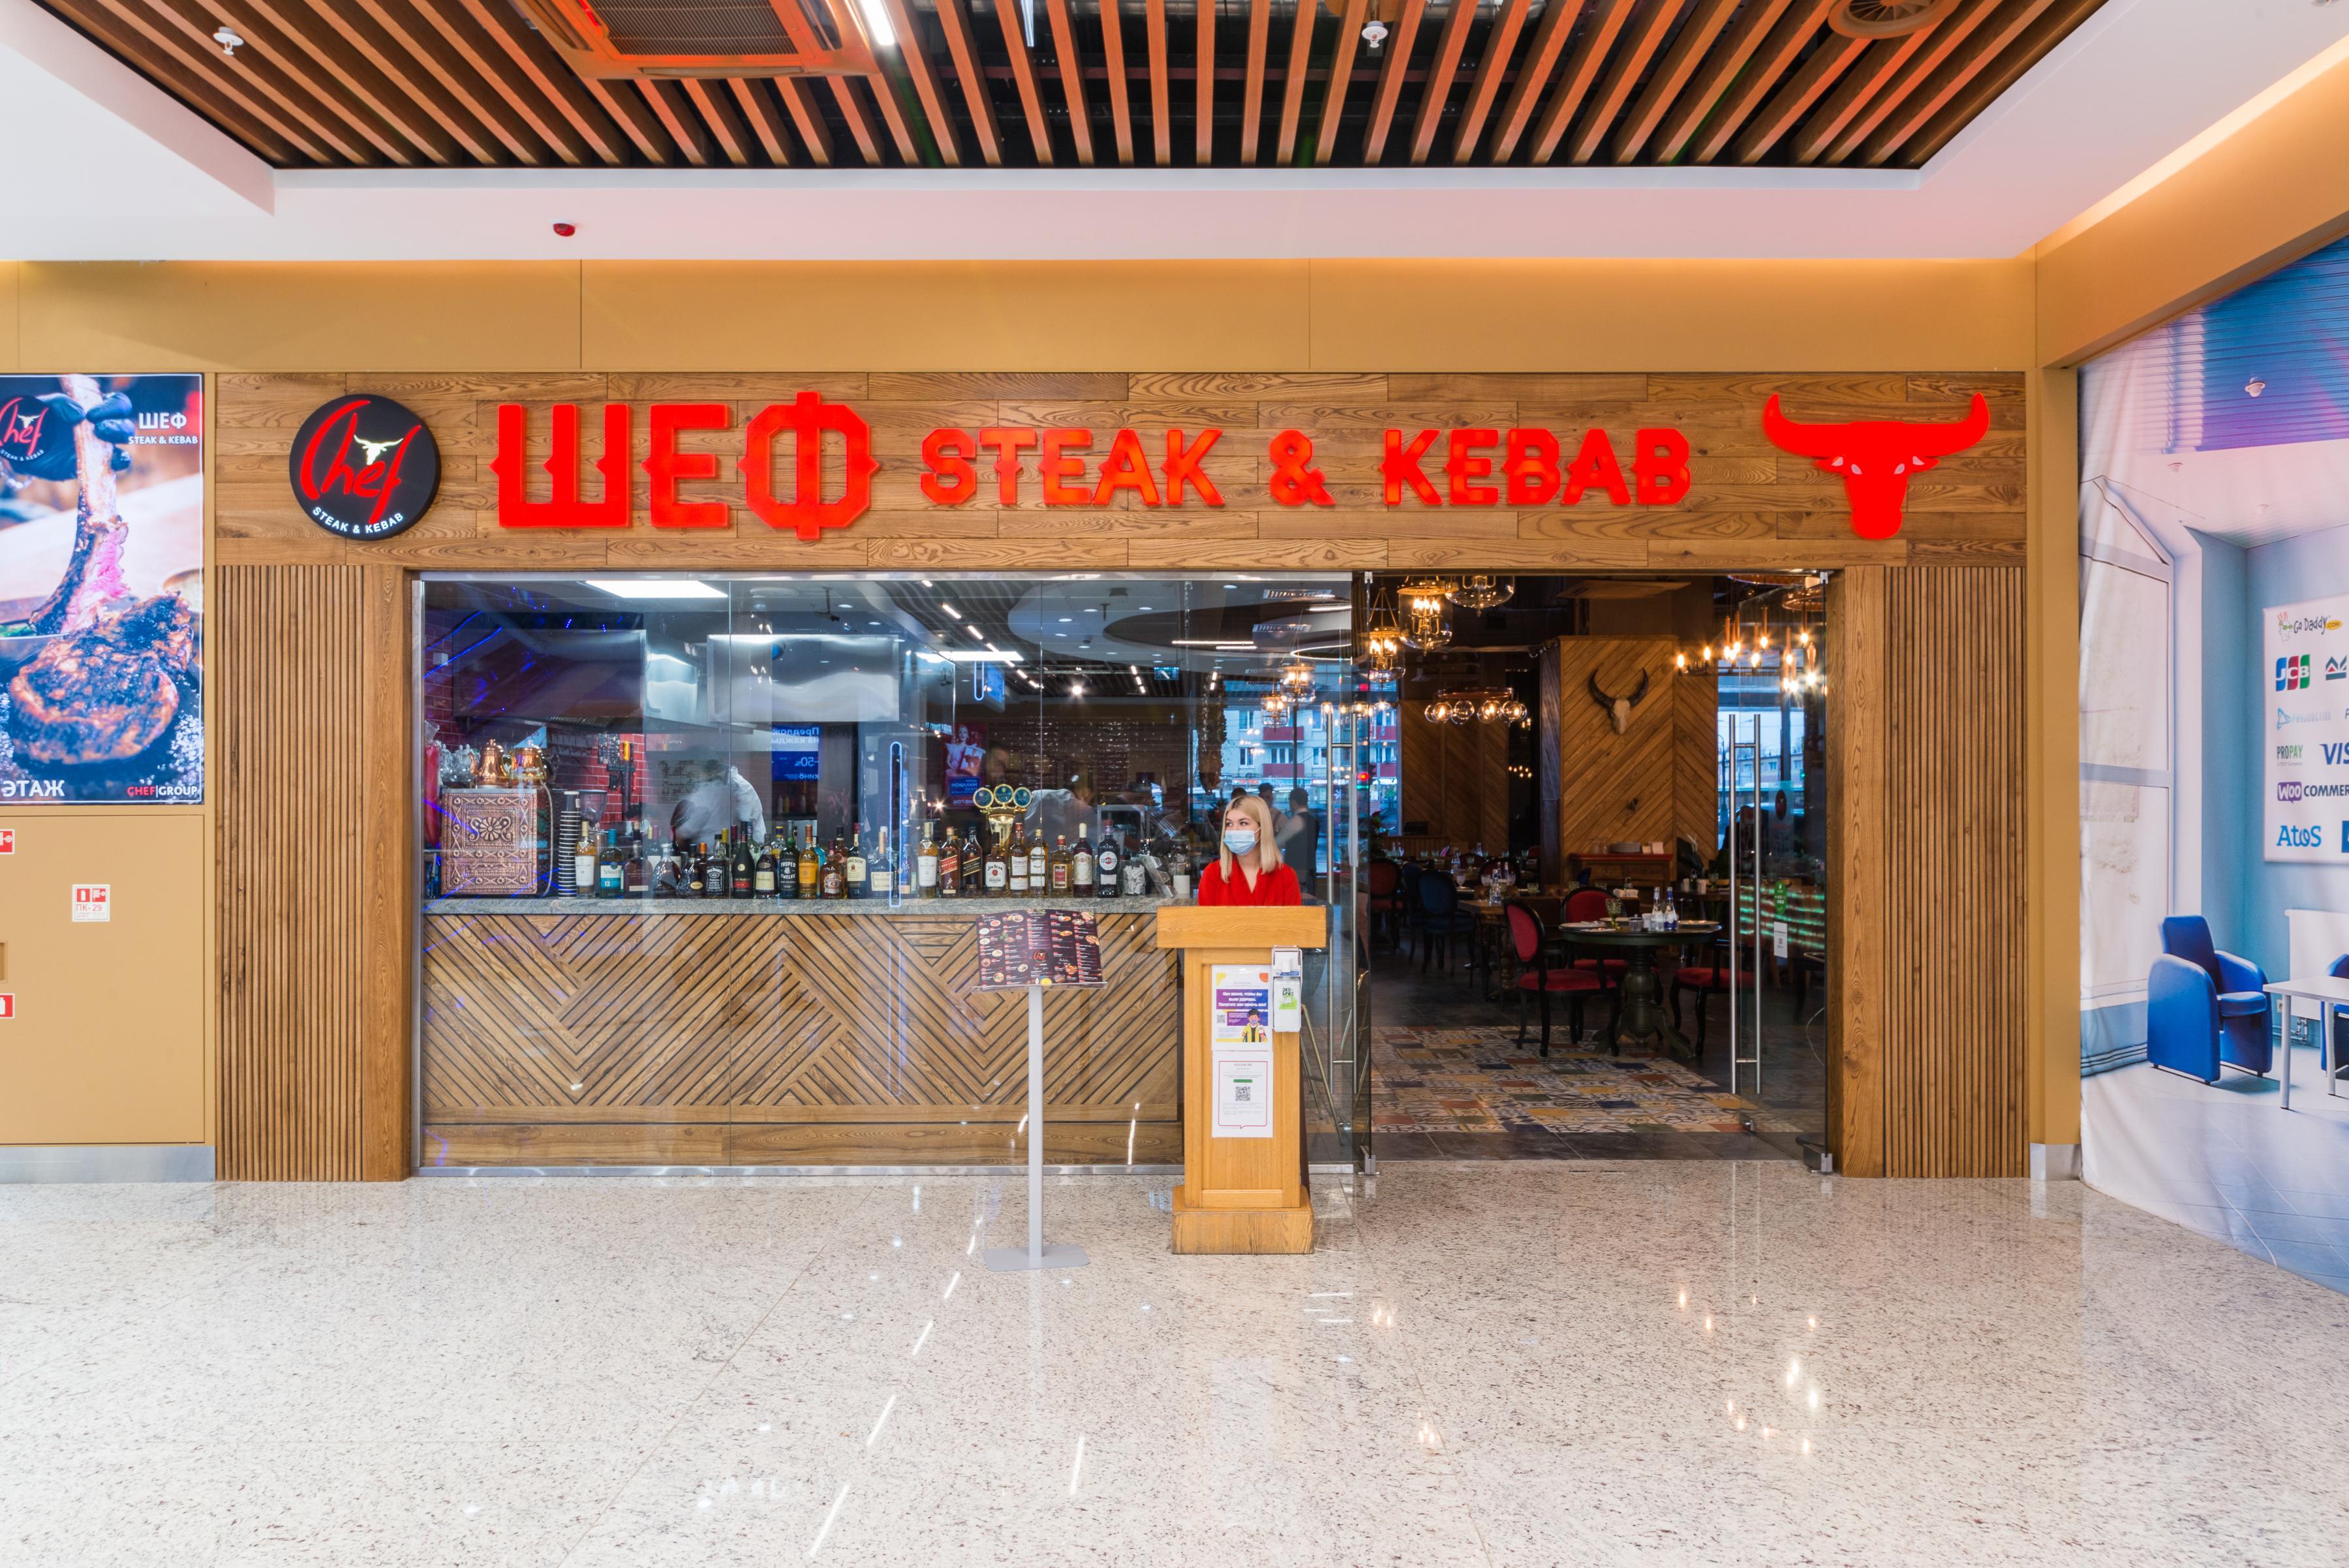 Chef Kebab & Steak